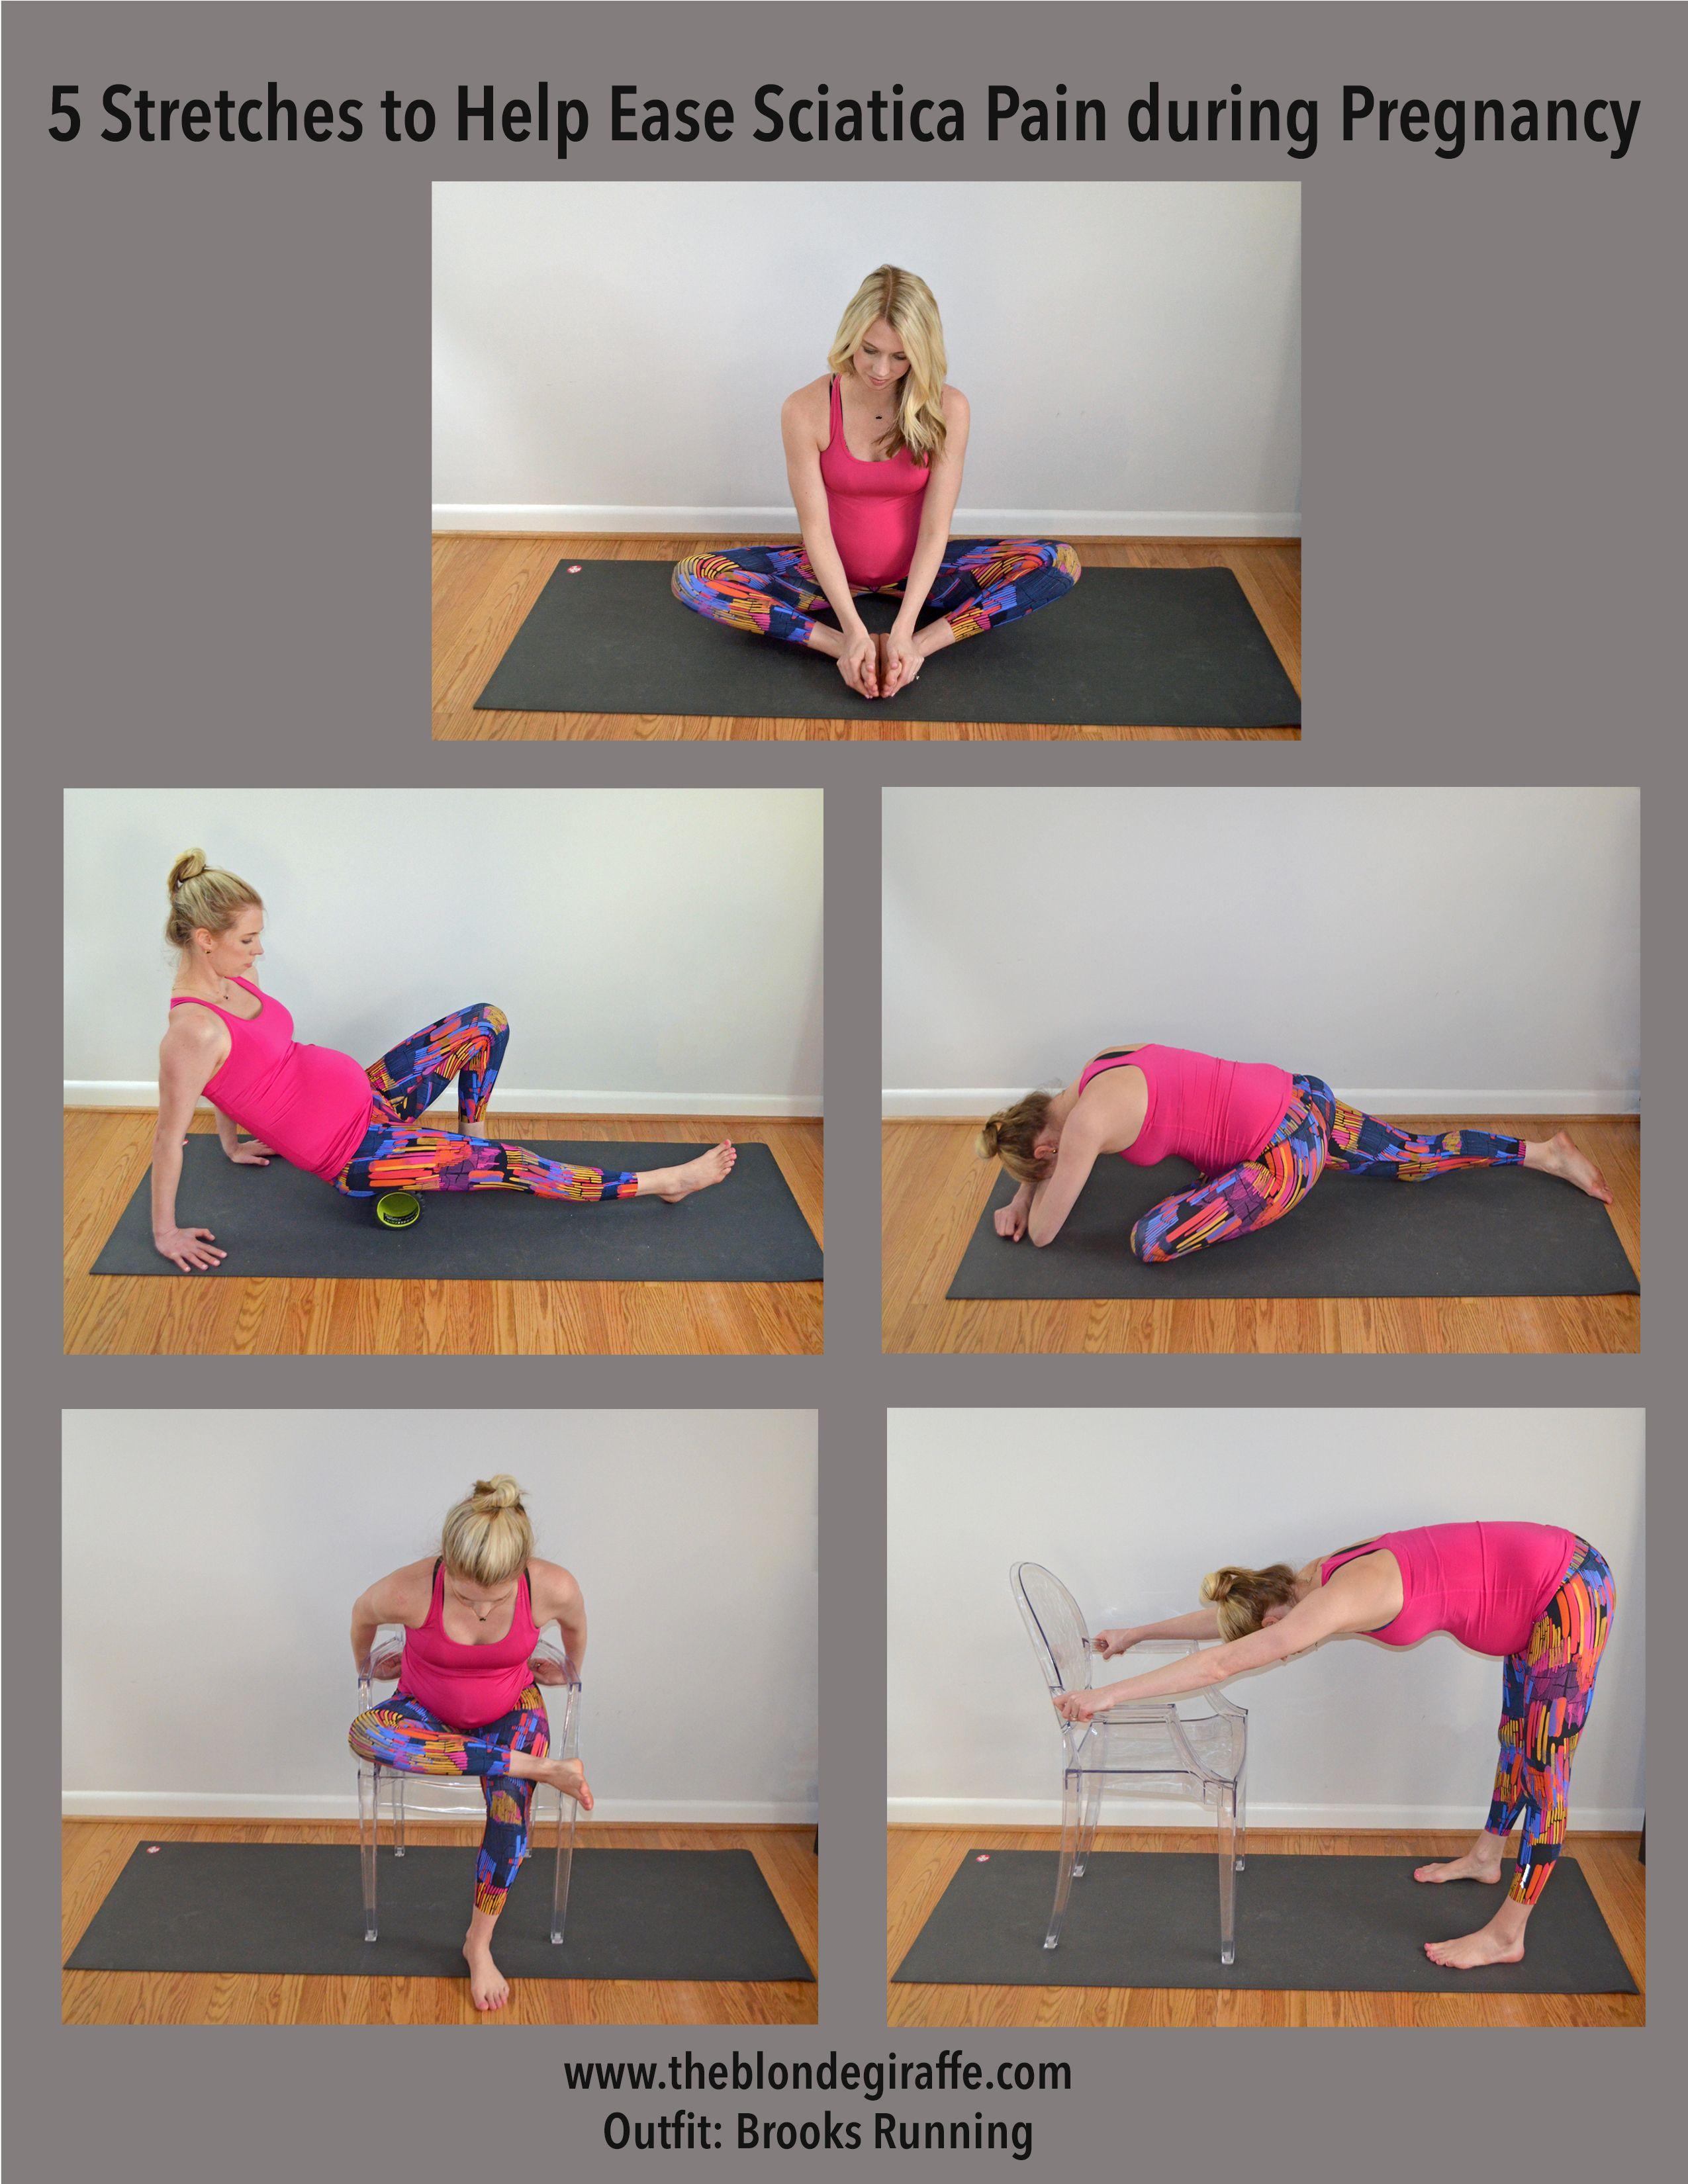 1f598d574d87bdde74896186d1666955 - How To Get Rid Of Back Pain When Your Pregnant